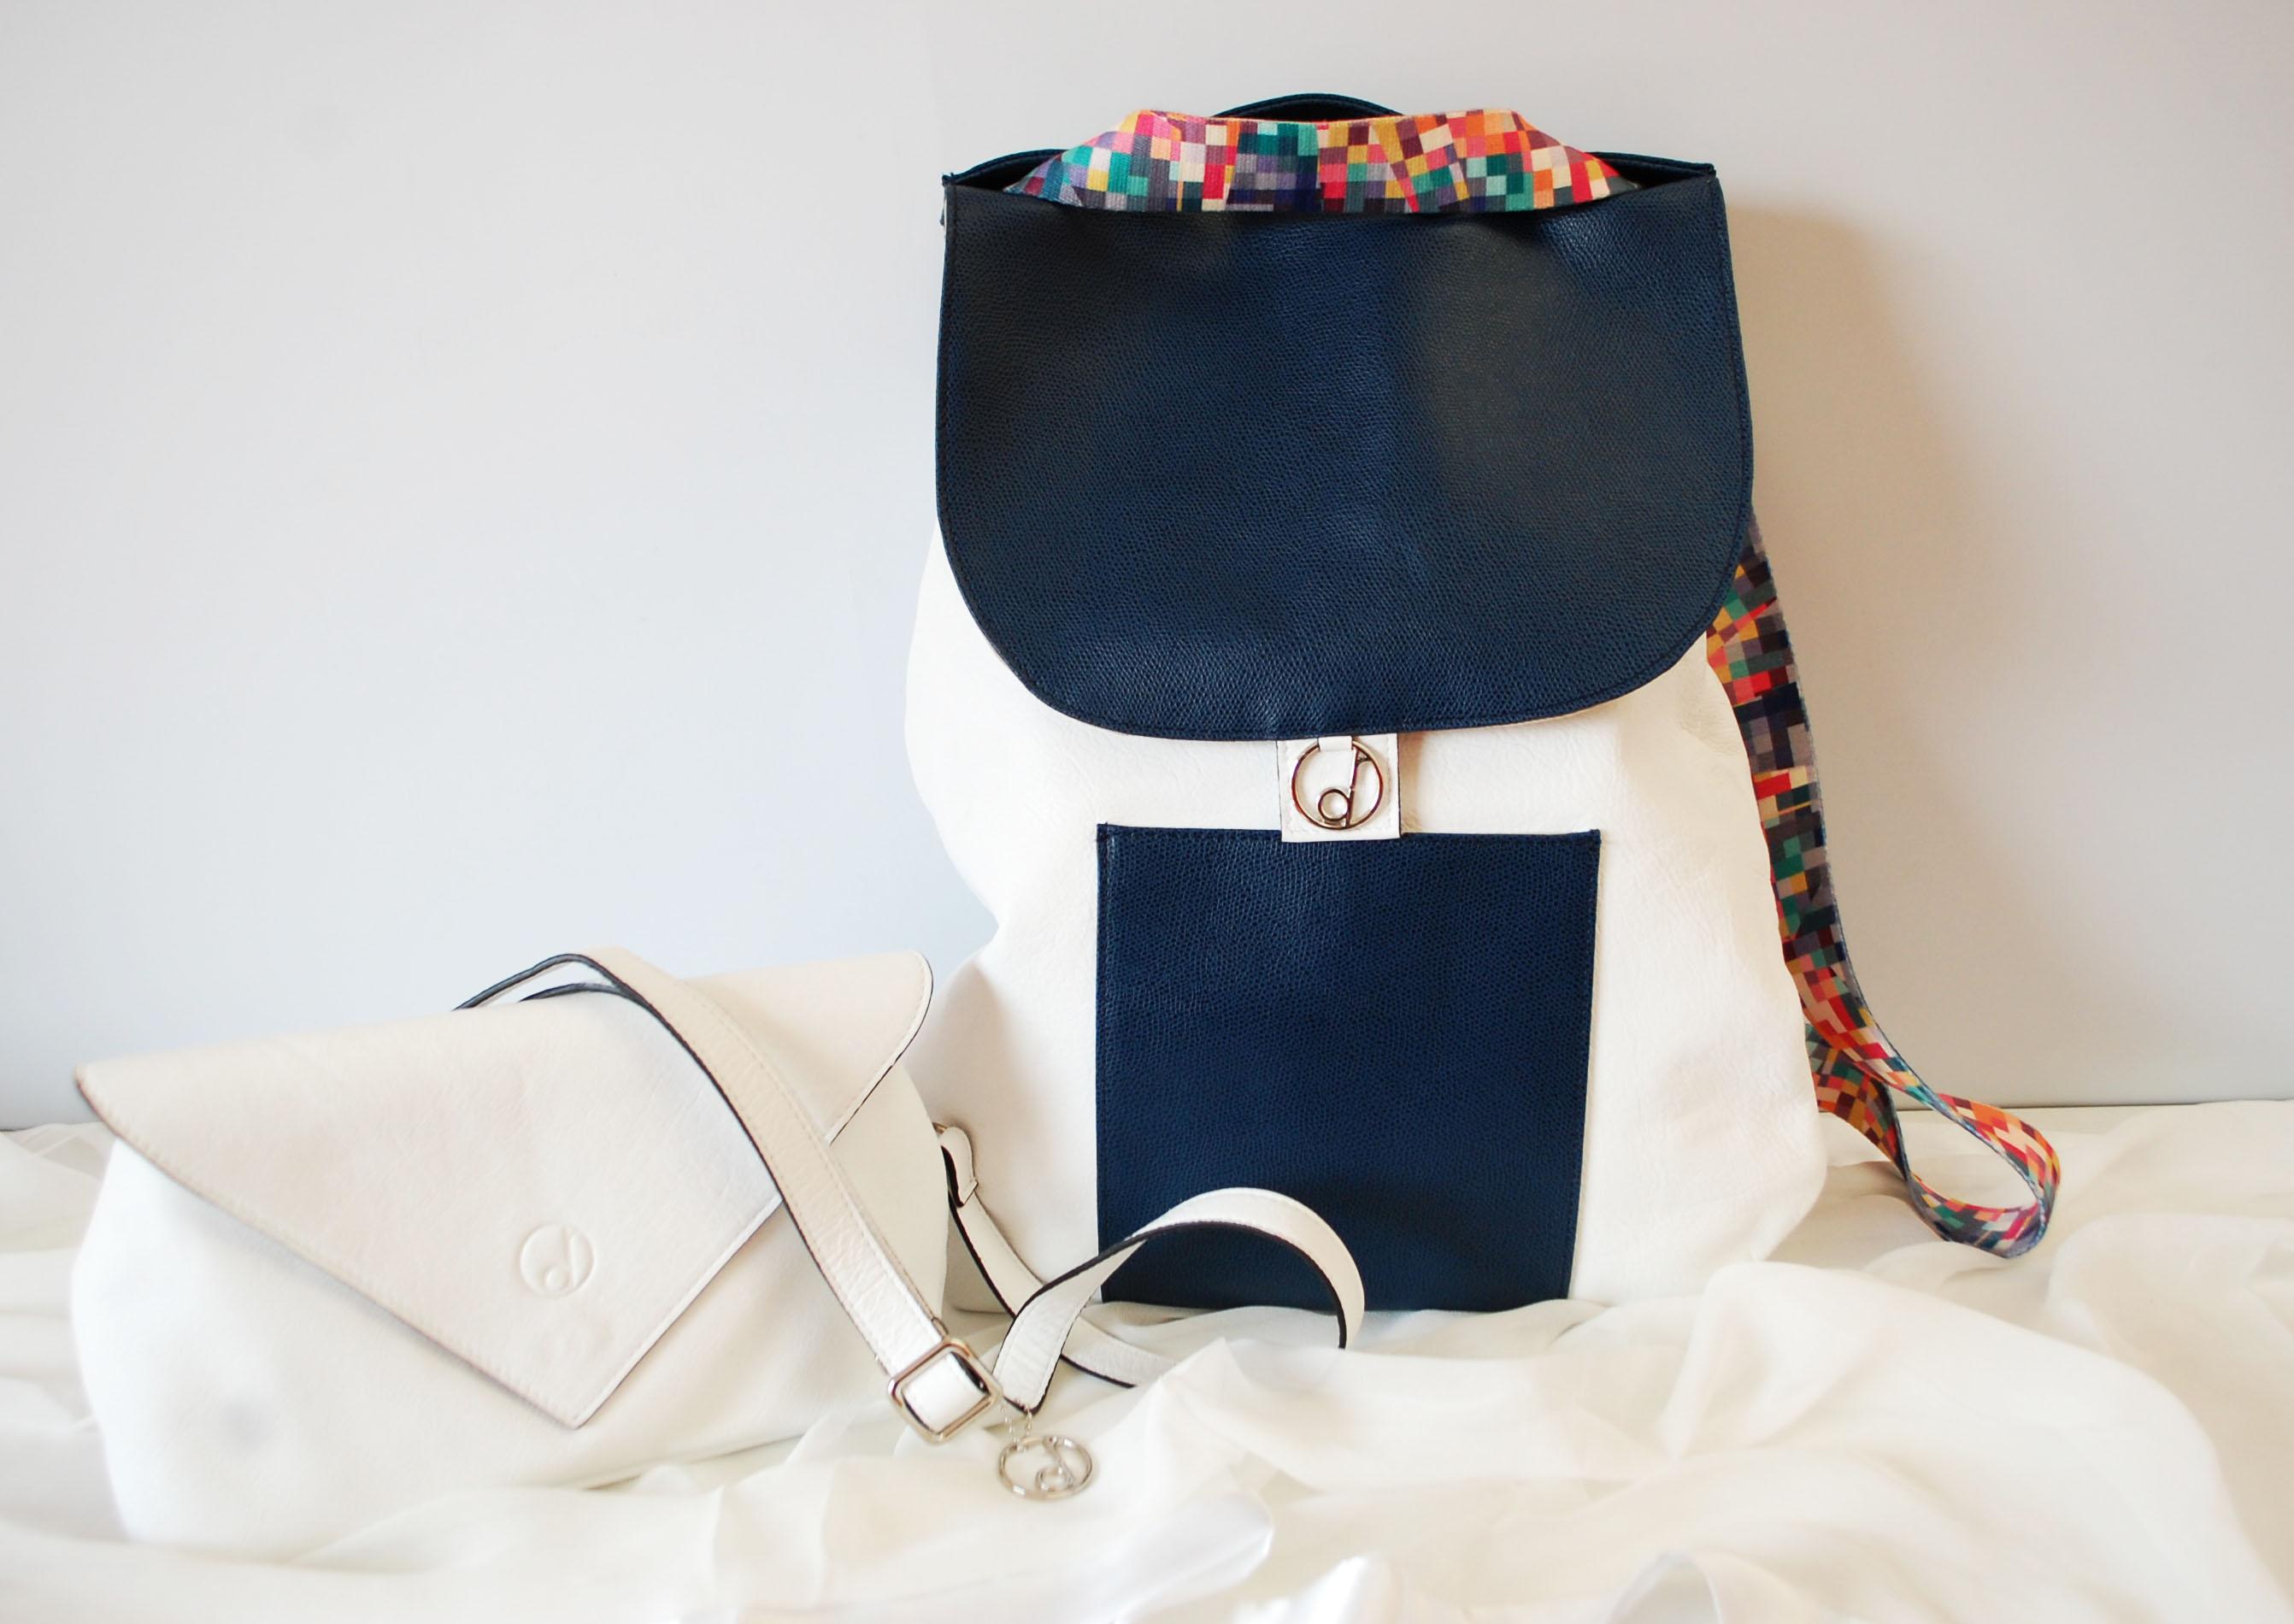 zaino-Nicole-pochette-Nina-summer16-bicolor-bianco-blu